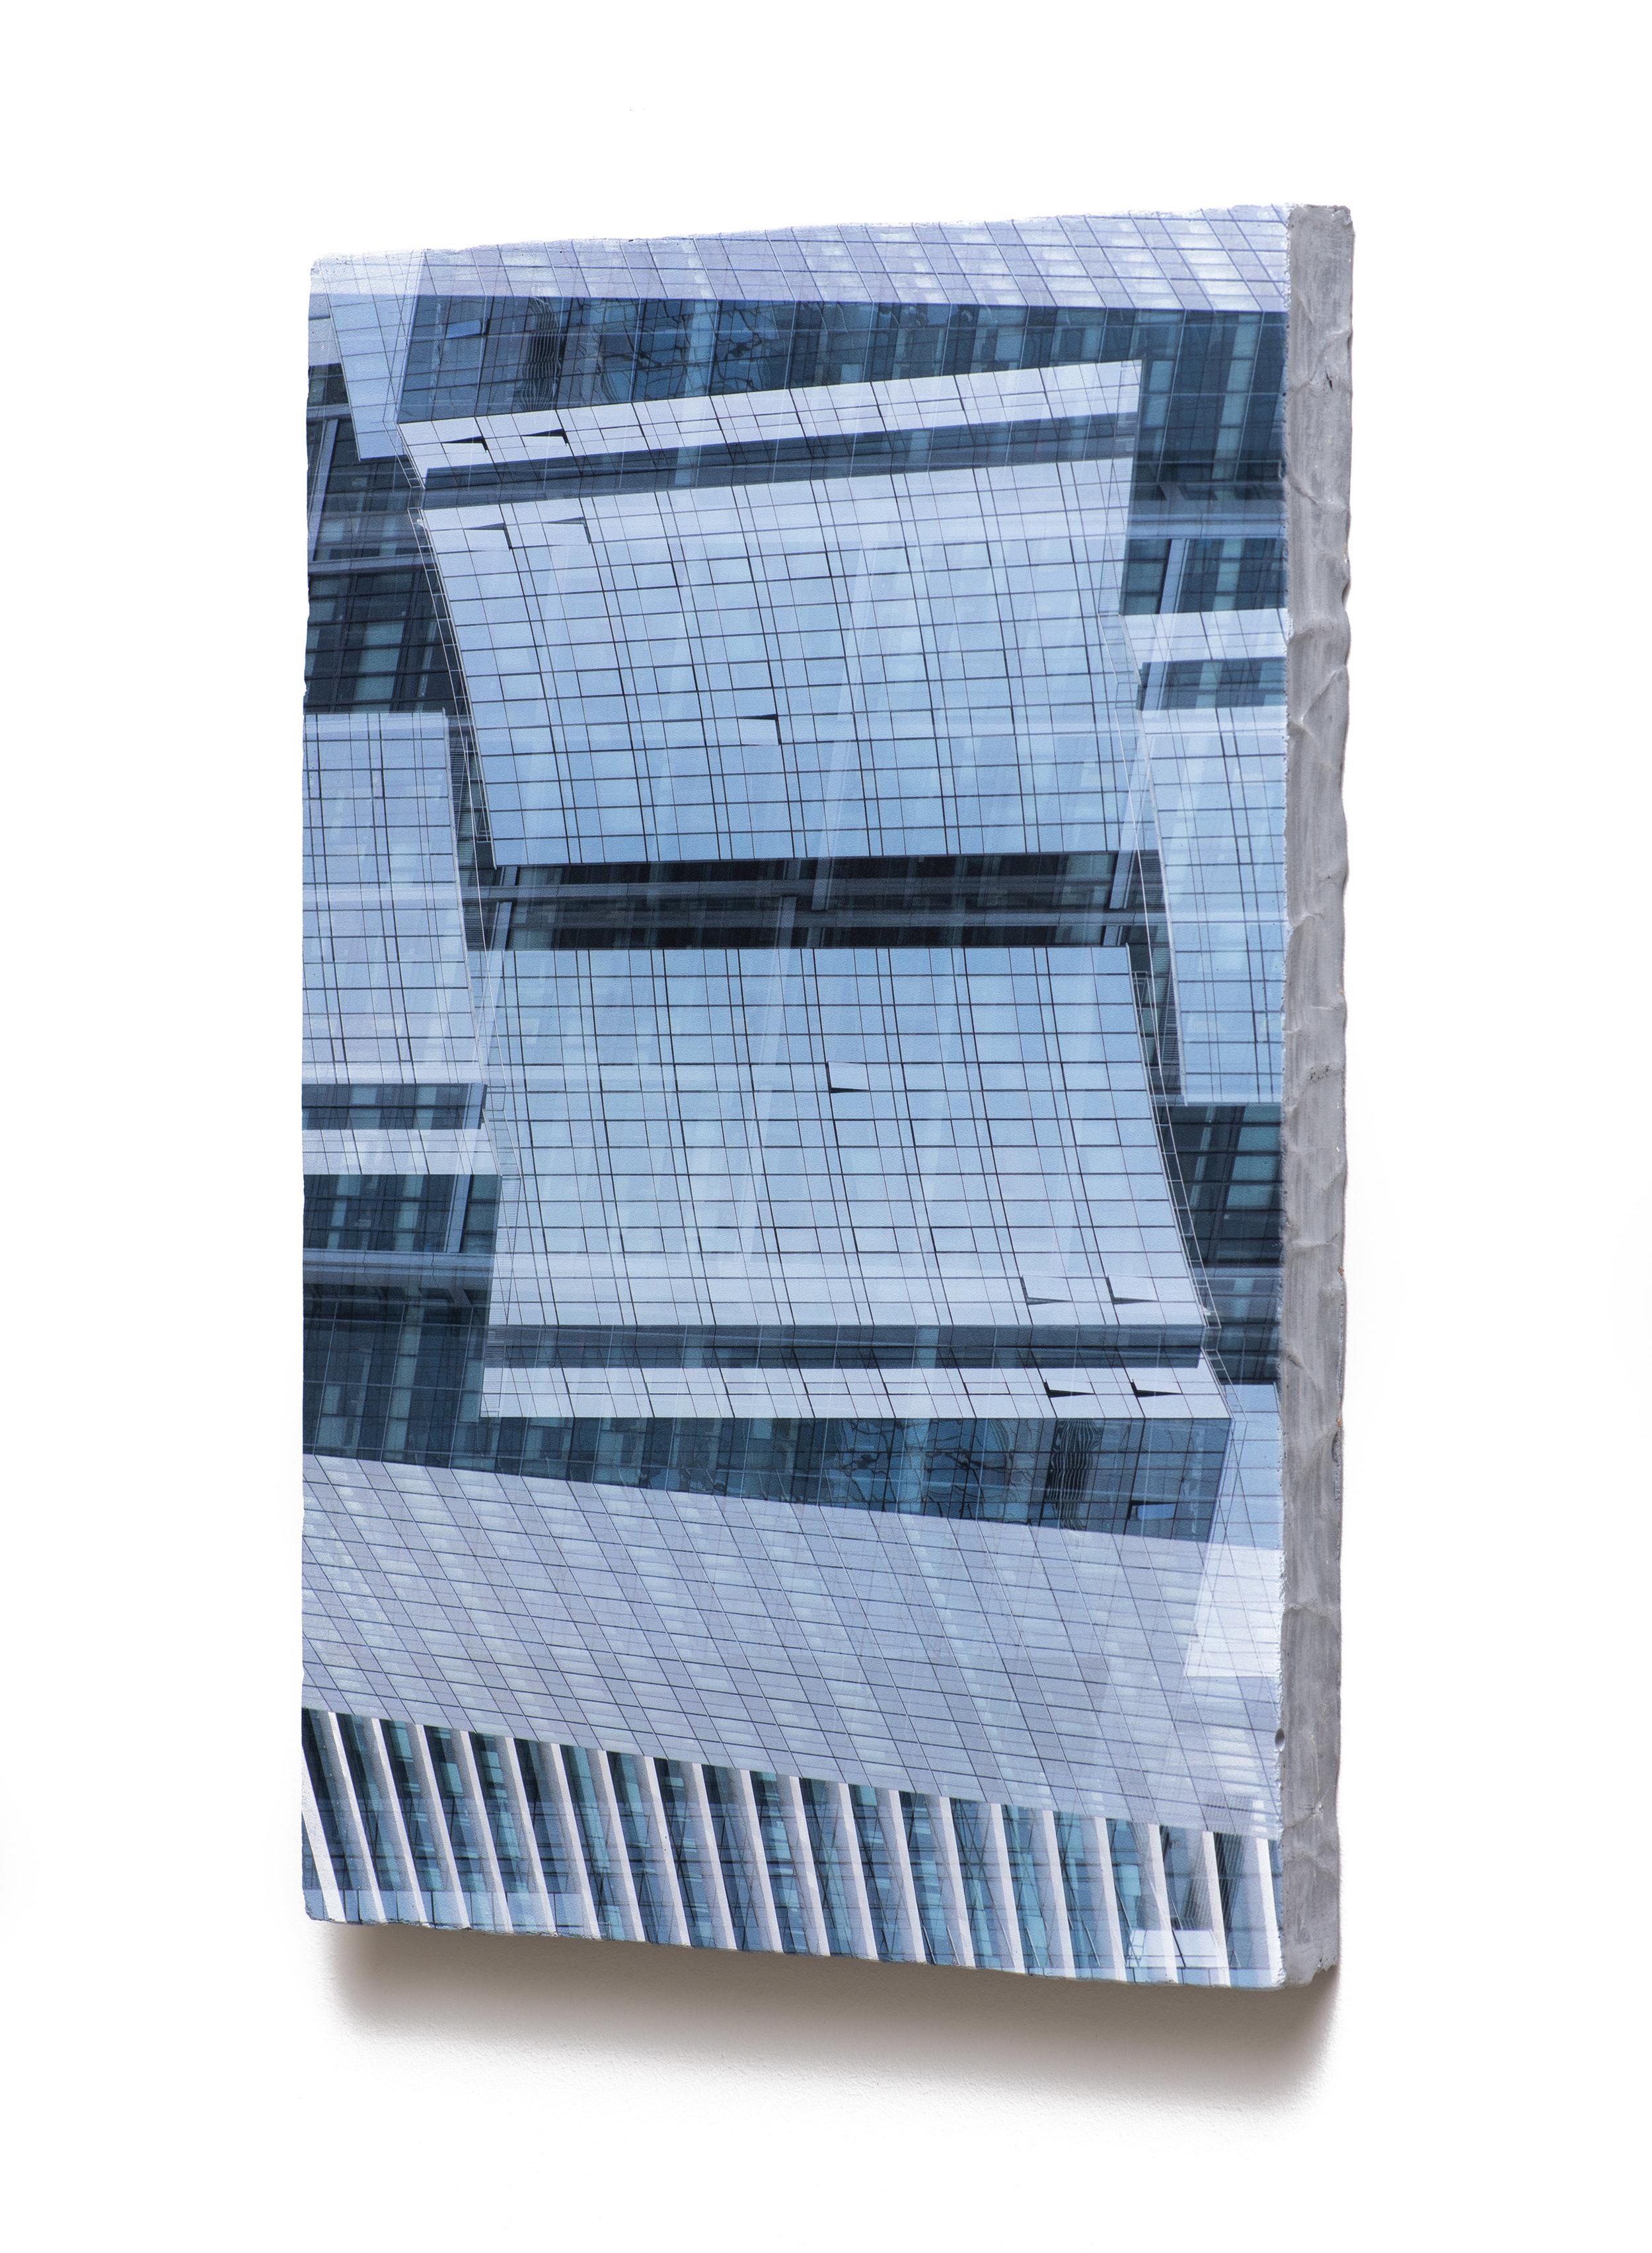 Counterform Planes, 2017 (oblique) UV ink on concrete 18 1/2 × 12 1/2 × 1 1/2 in Unique